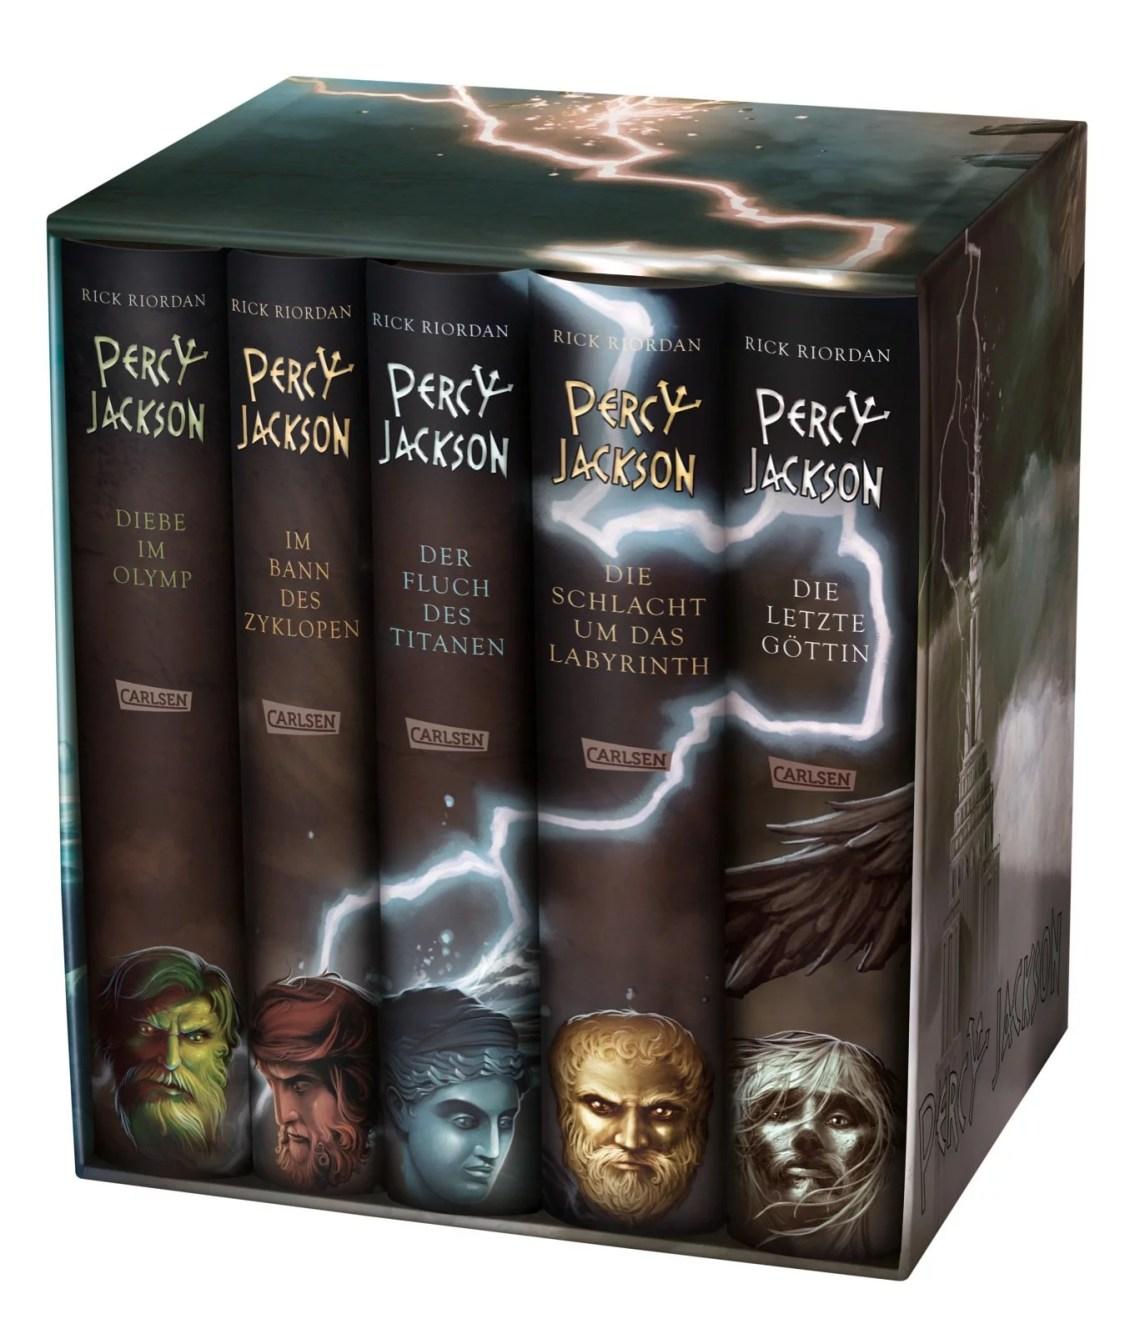 Percy Jackson: Percy-Jackson-Schuber - inkl. E-Book Kane-Chroniken Bd. 1